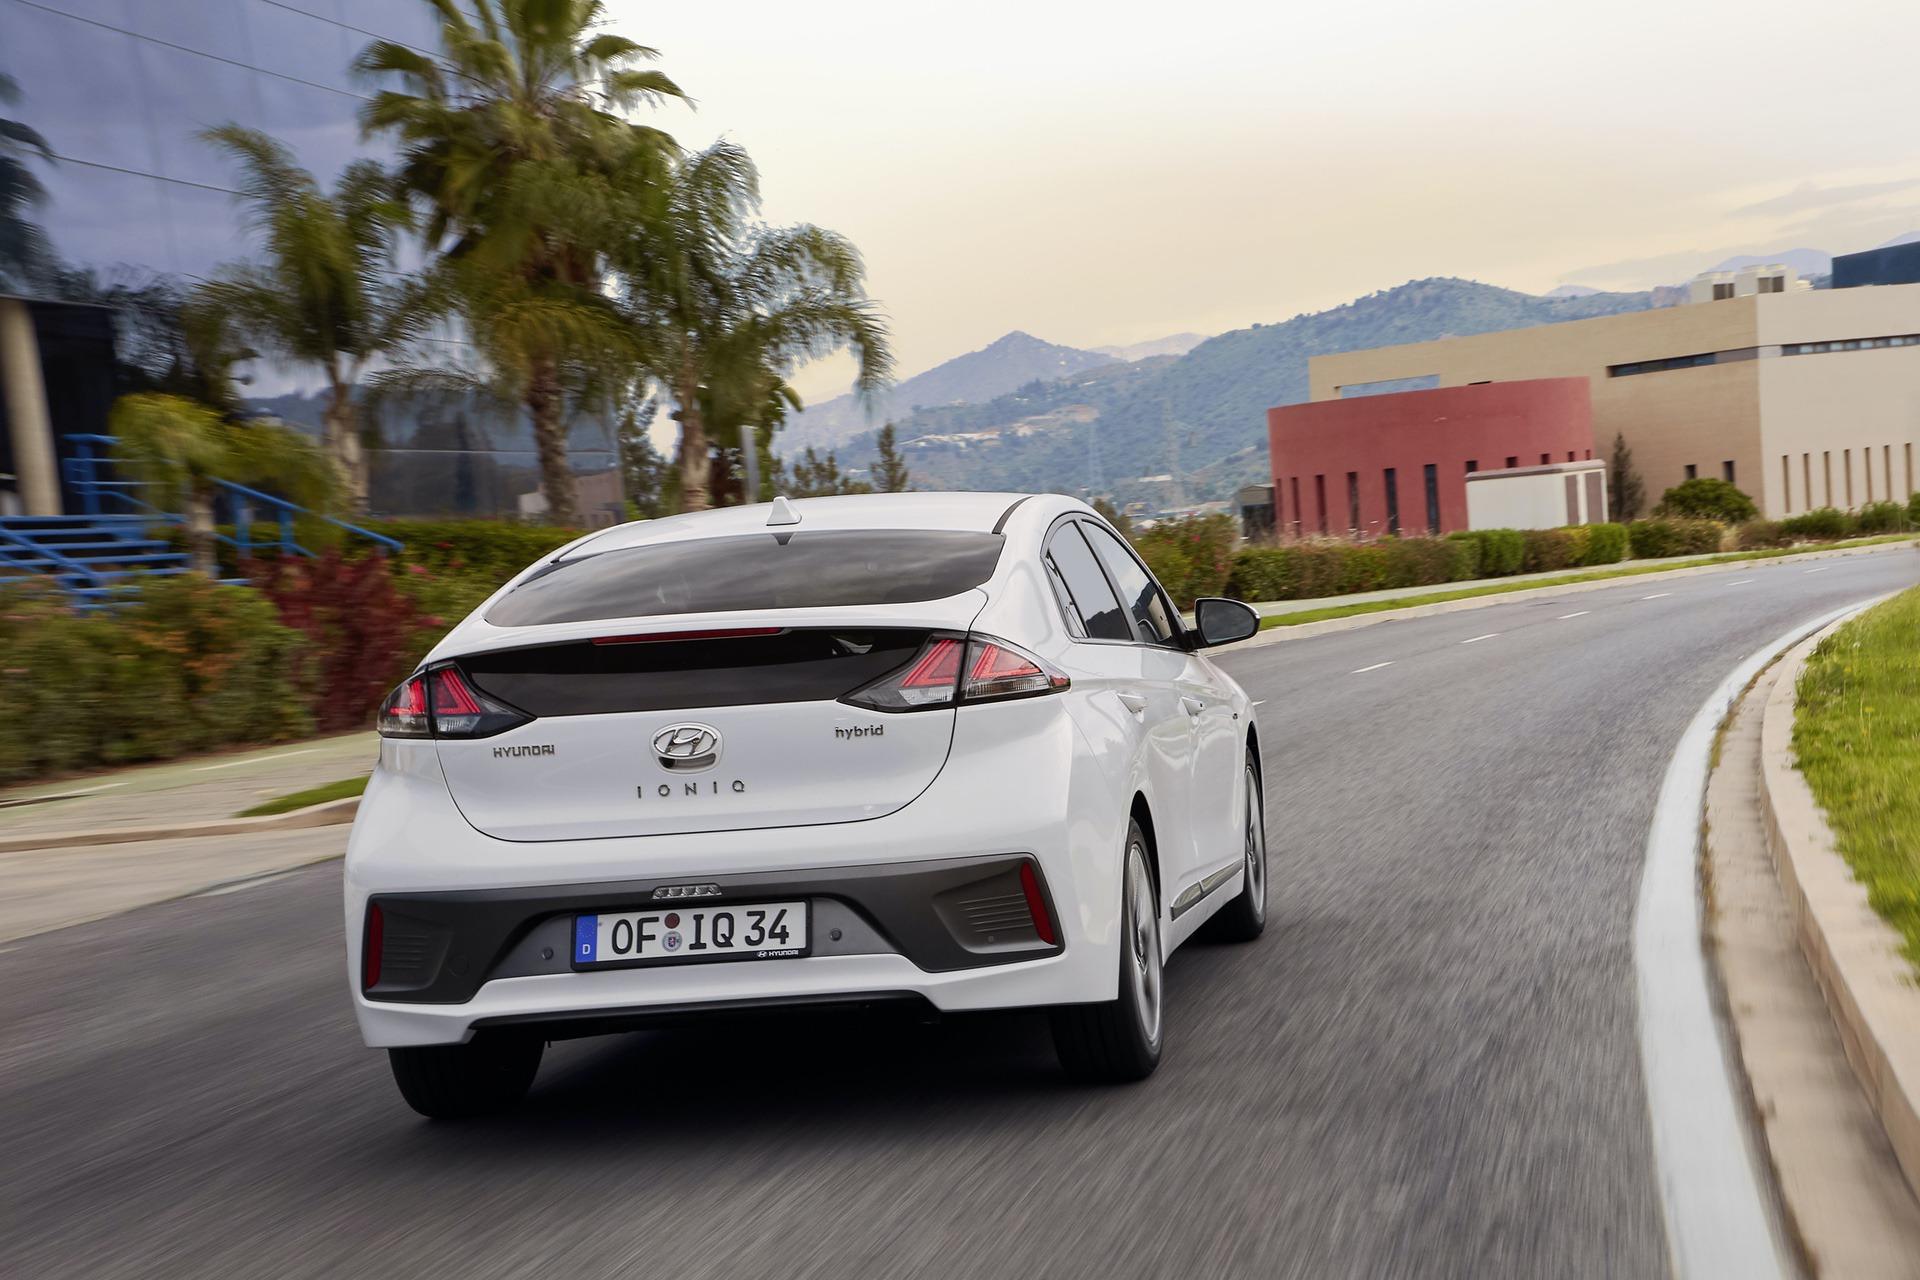 New-Hyundai-IONIQ-Hybrid-18